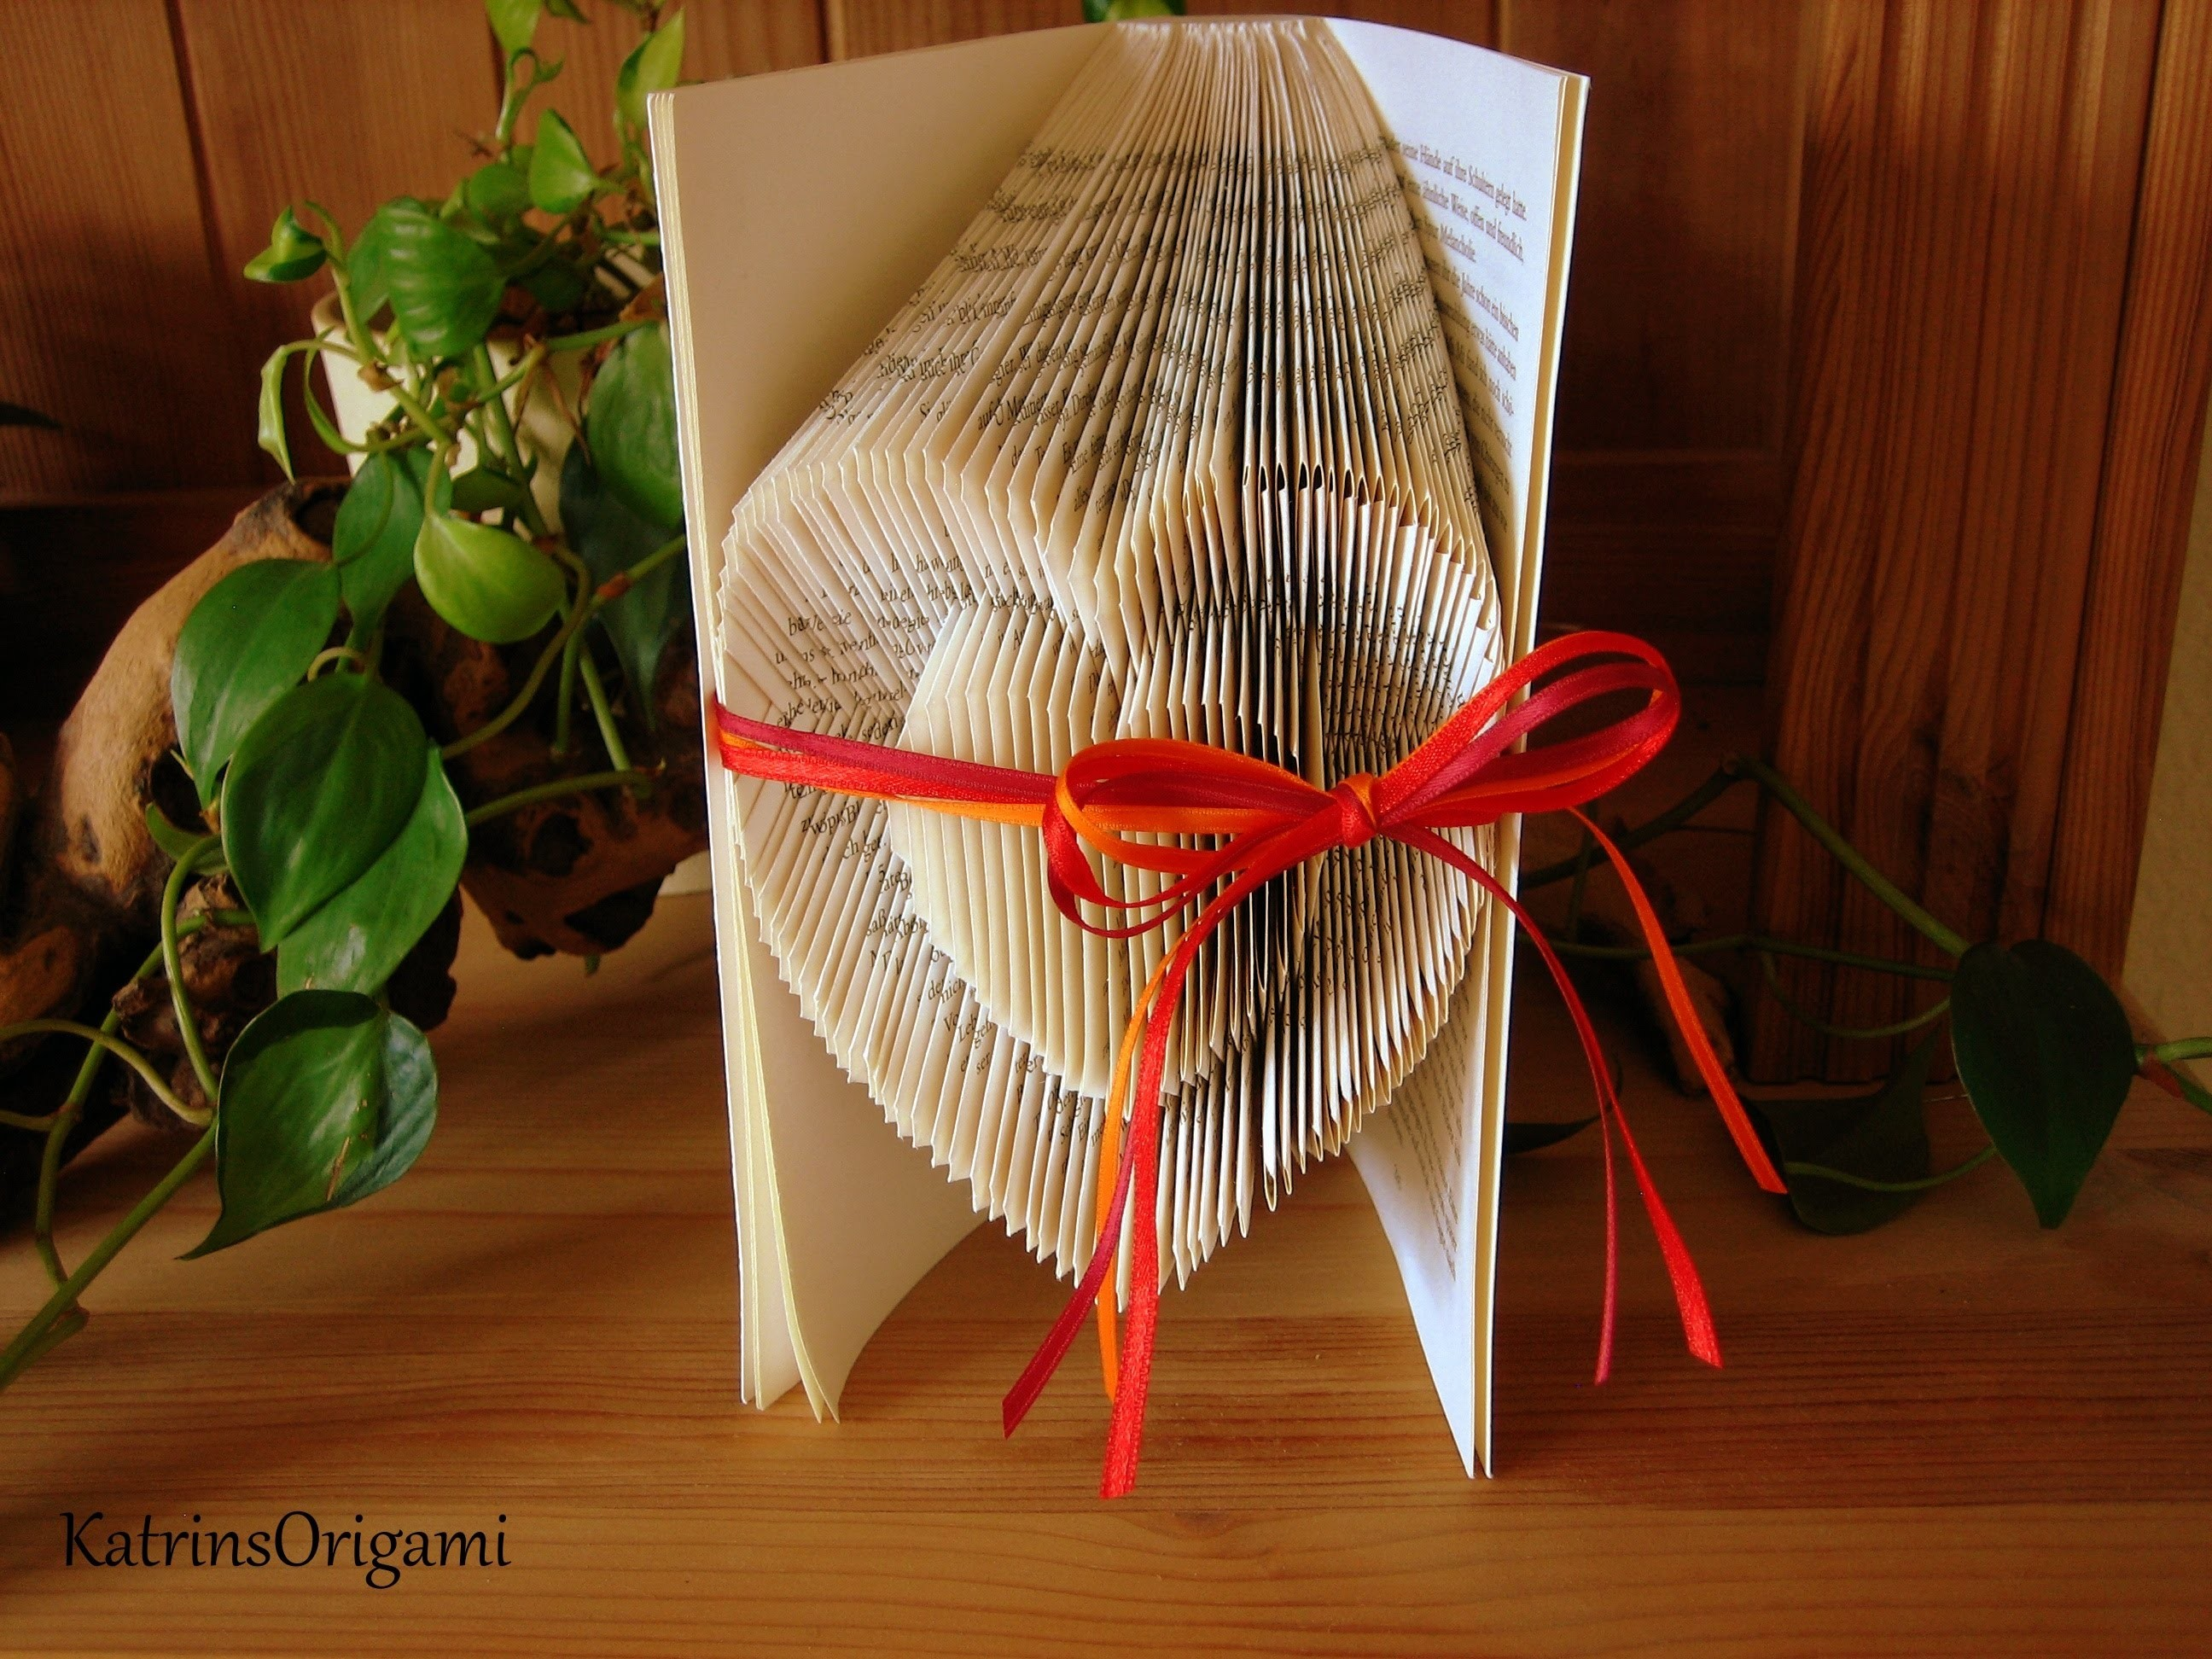 Book folding Art - Origami Sculpture